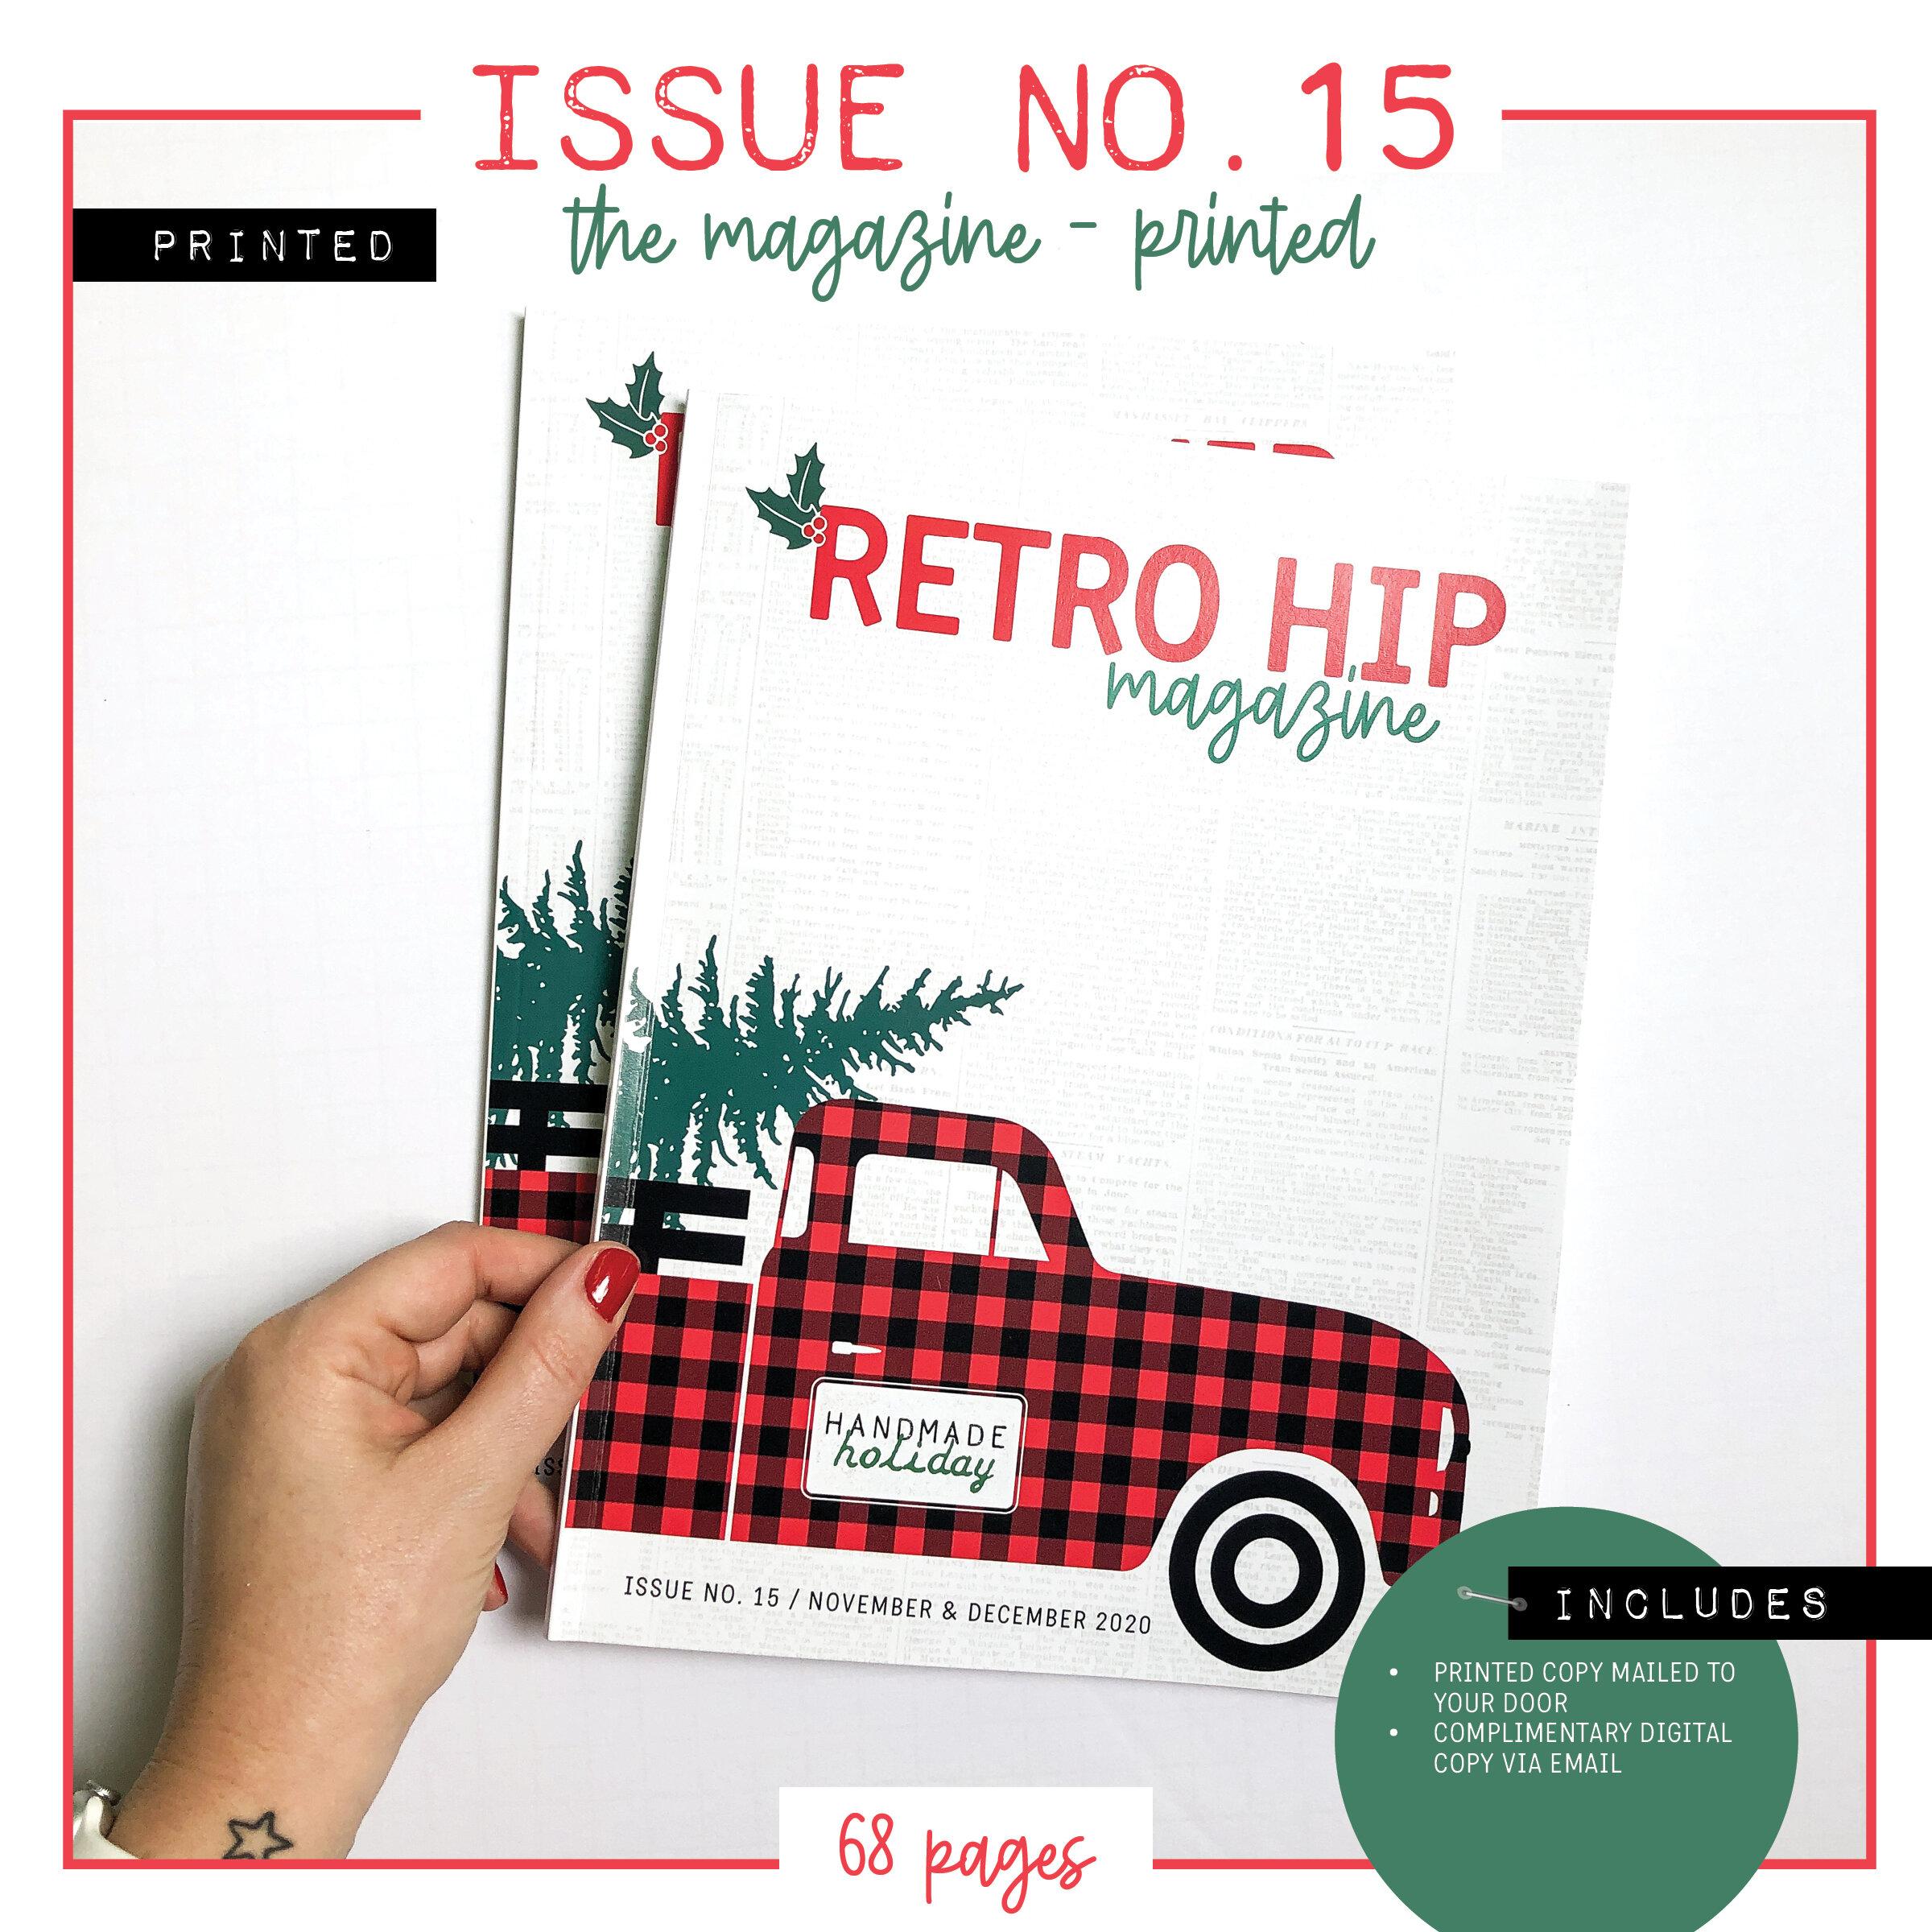 RetroHip Magazine Issue 15